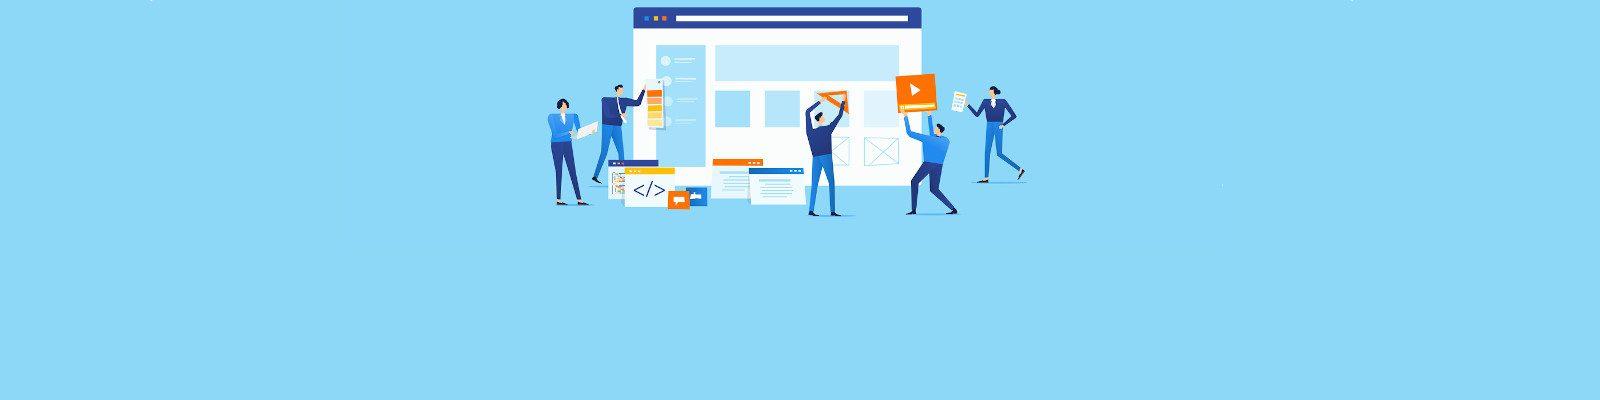 webseiten-konfigurator1